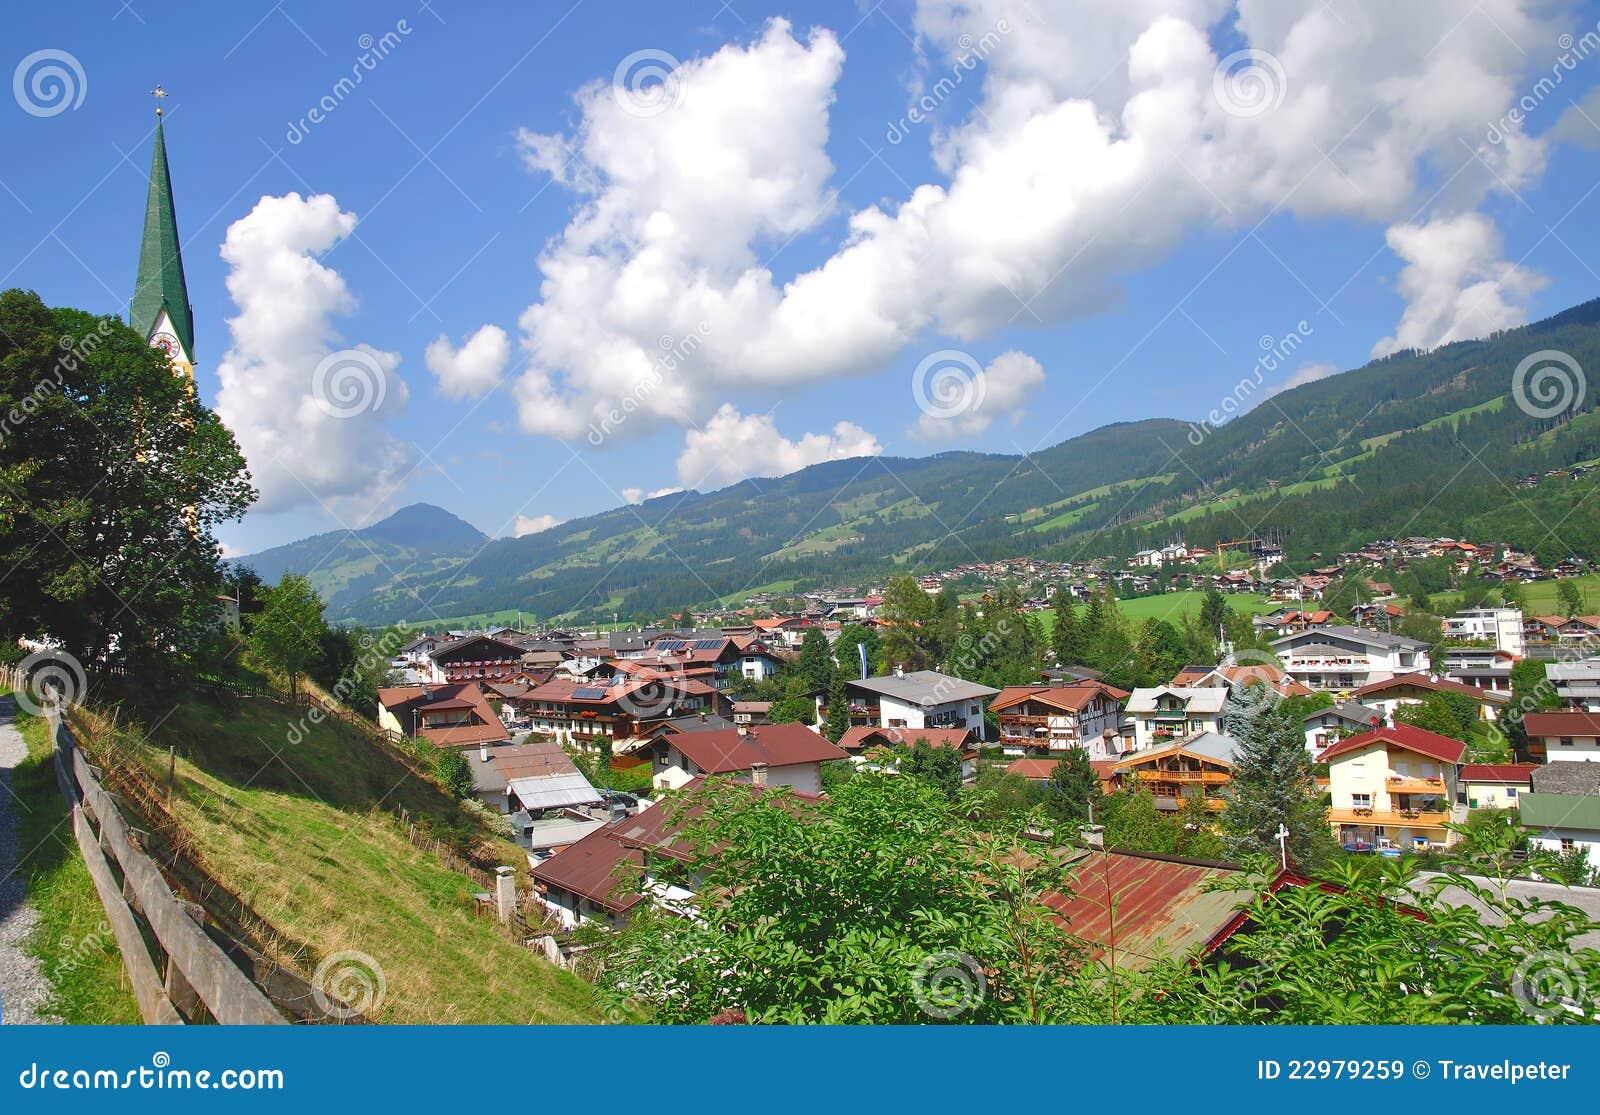 Kirchberg in Tirol Austria  city photo : The village of Kirchberg in Tirol,Austria.